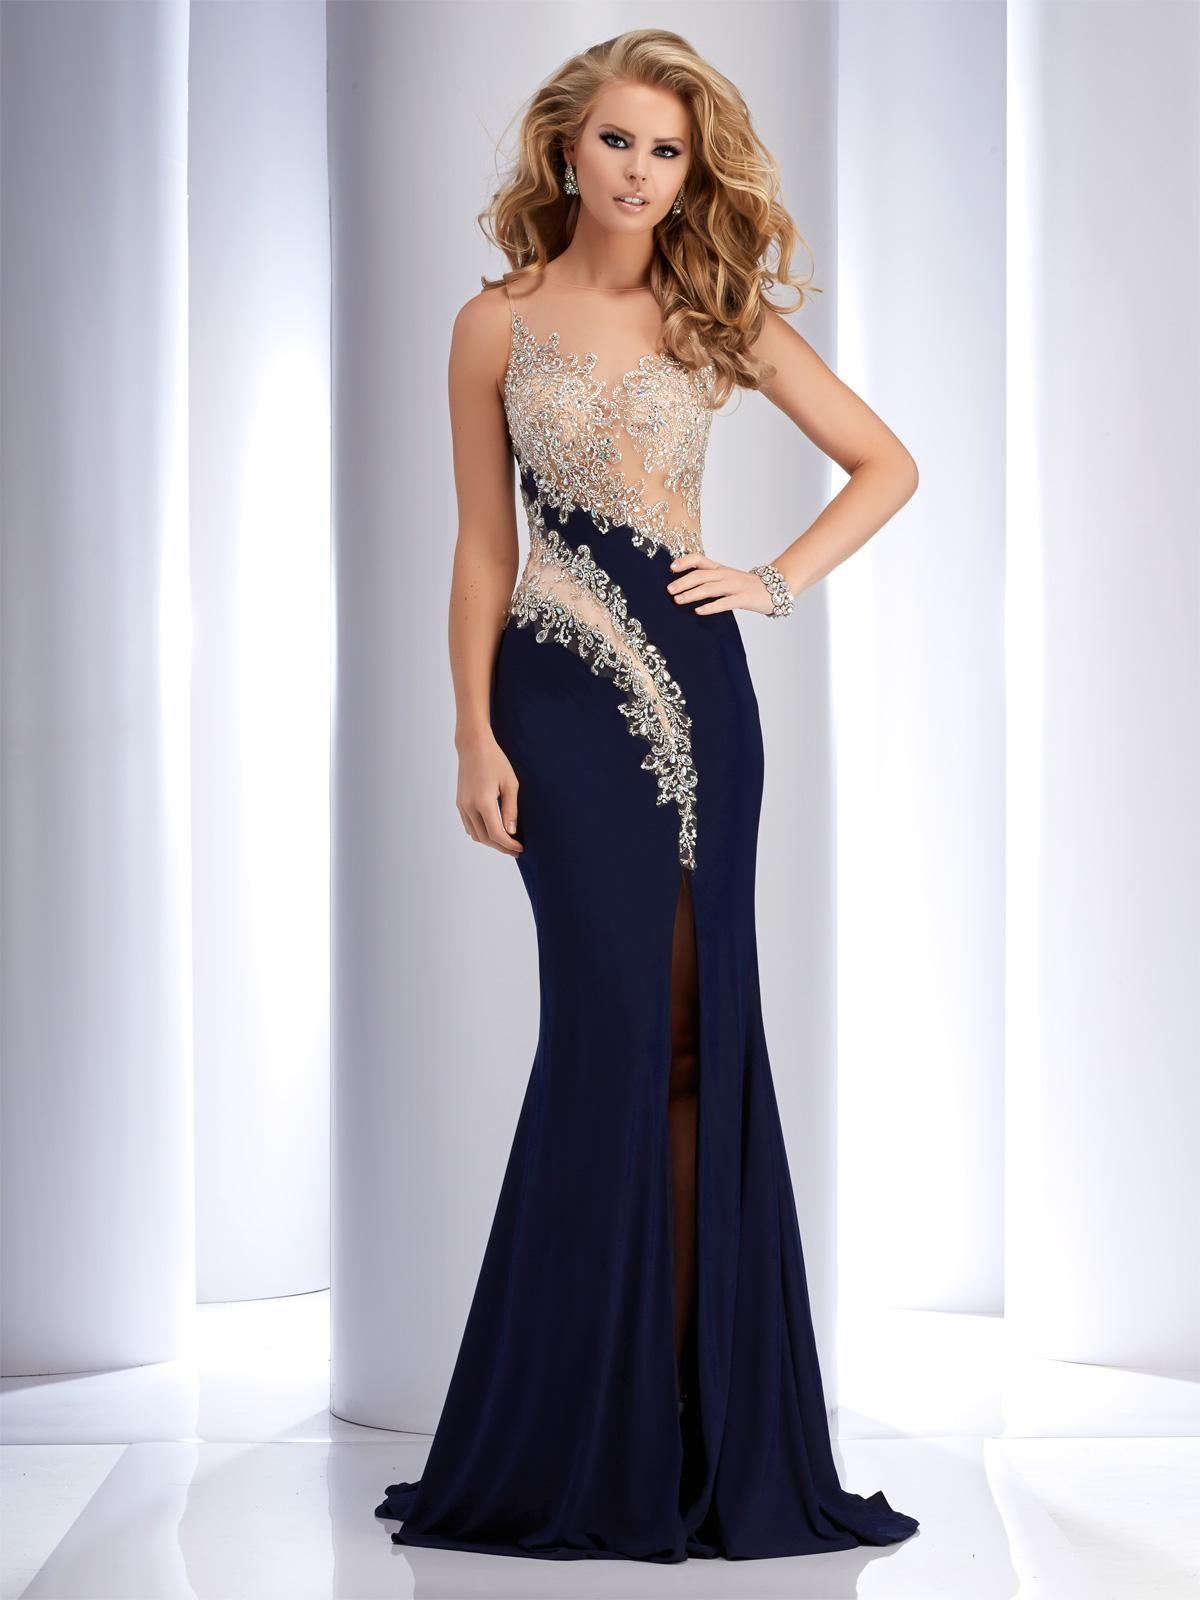 Strapless empire hilow studio prom dress dressprom